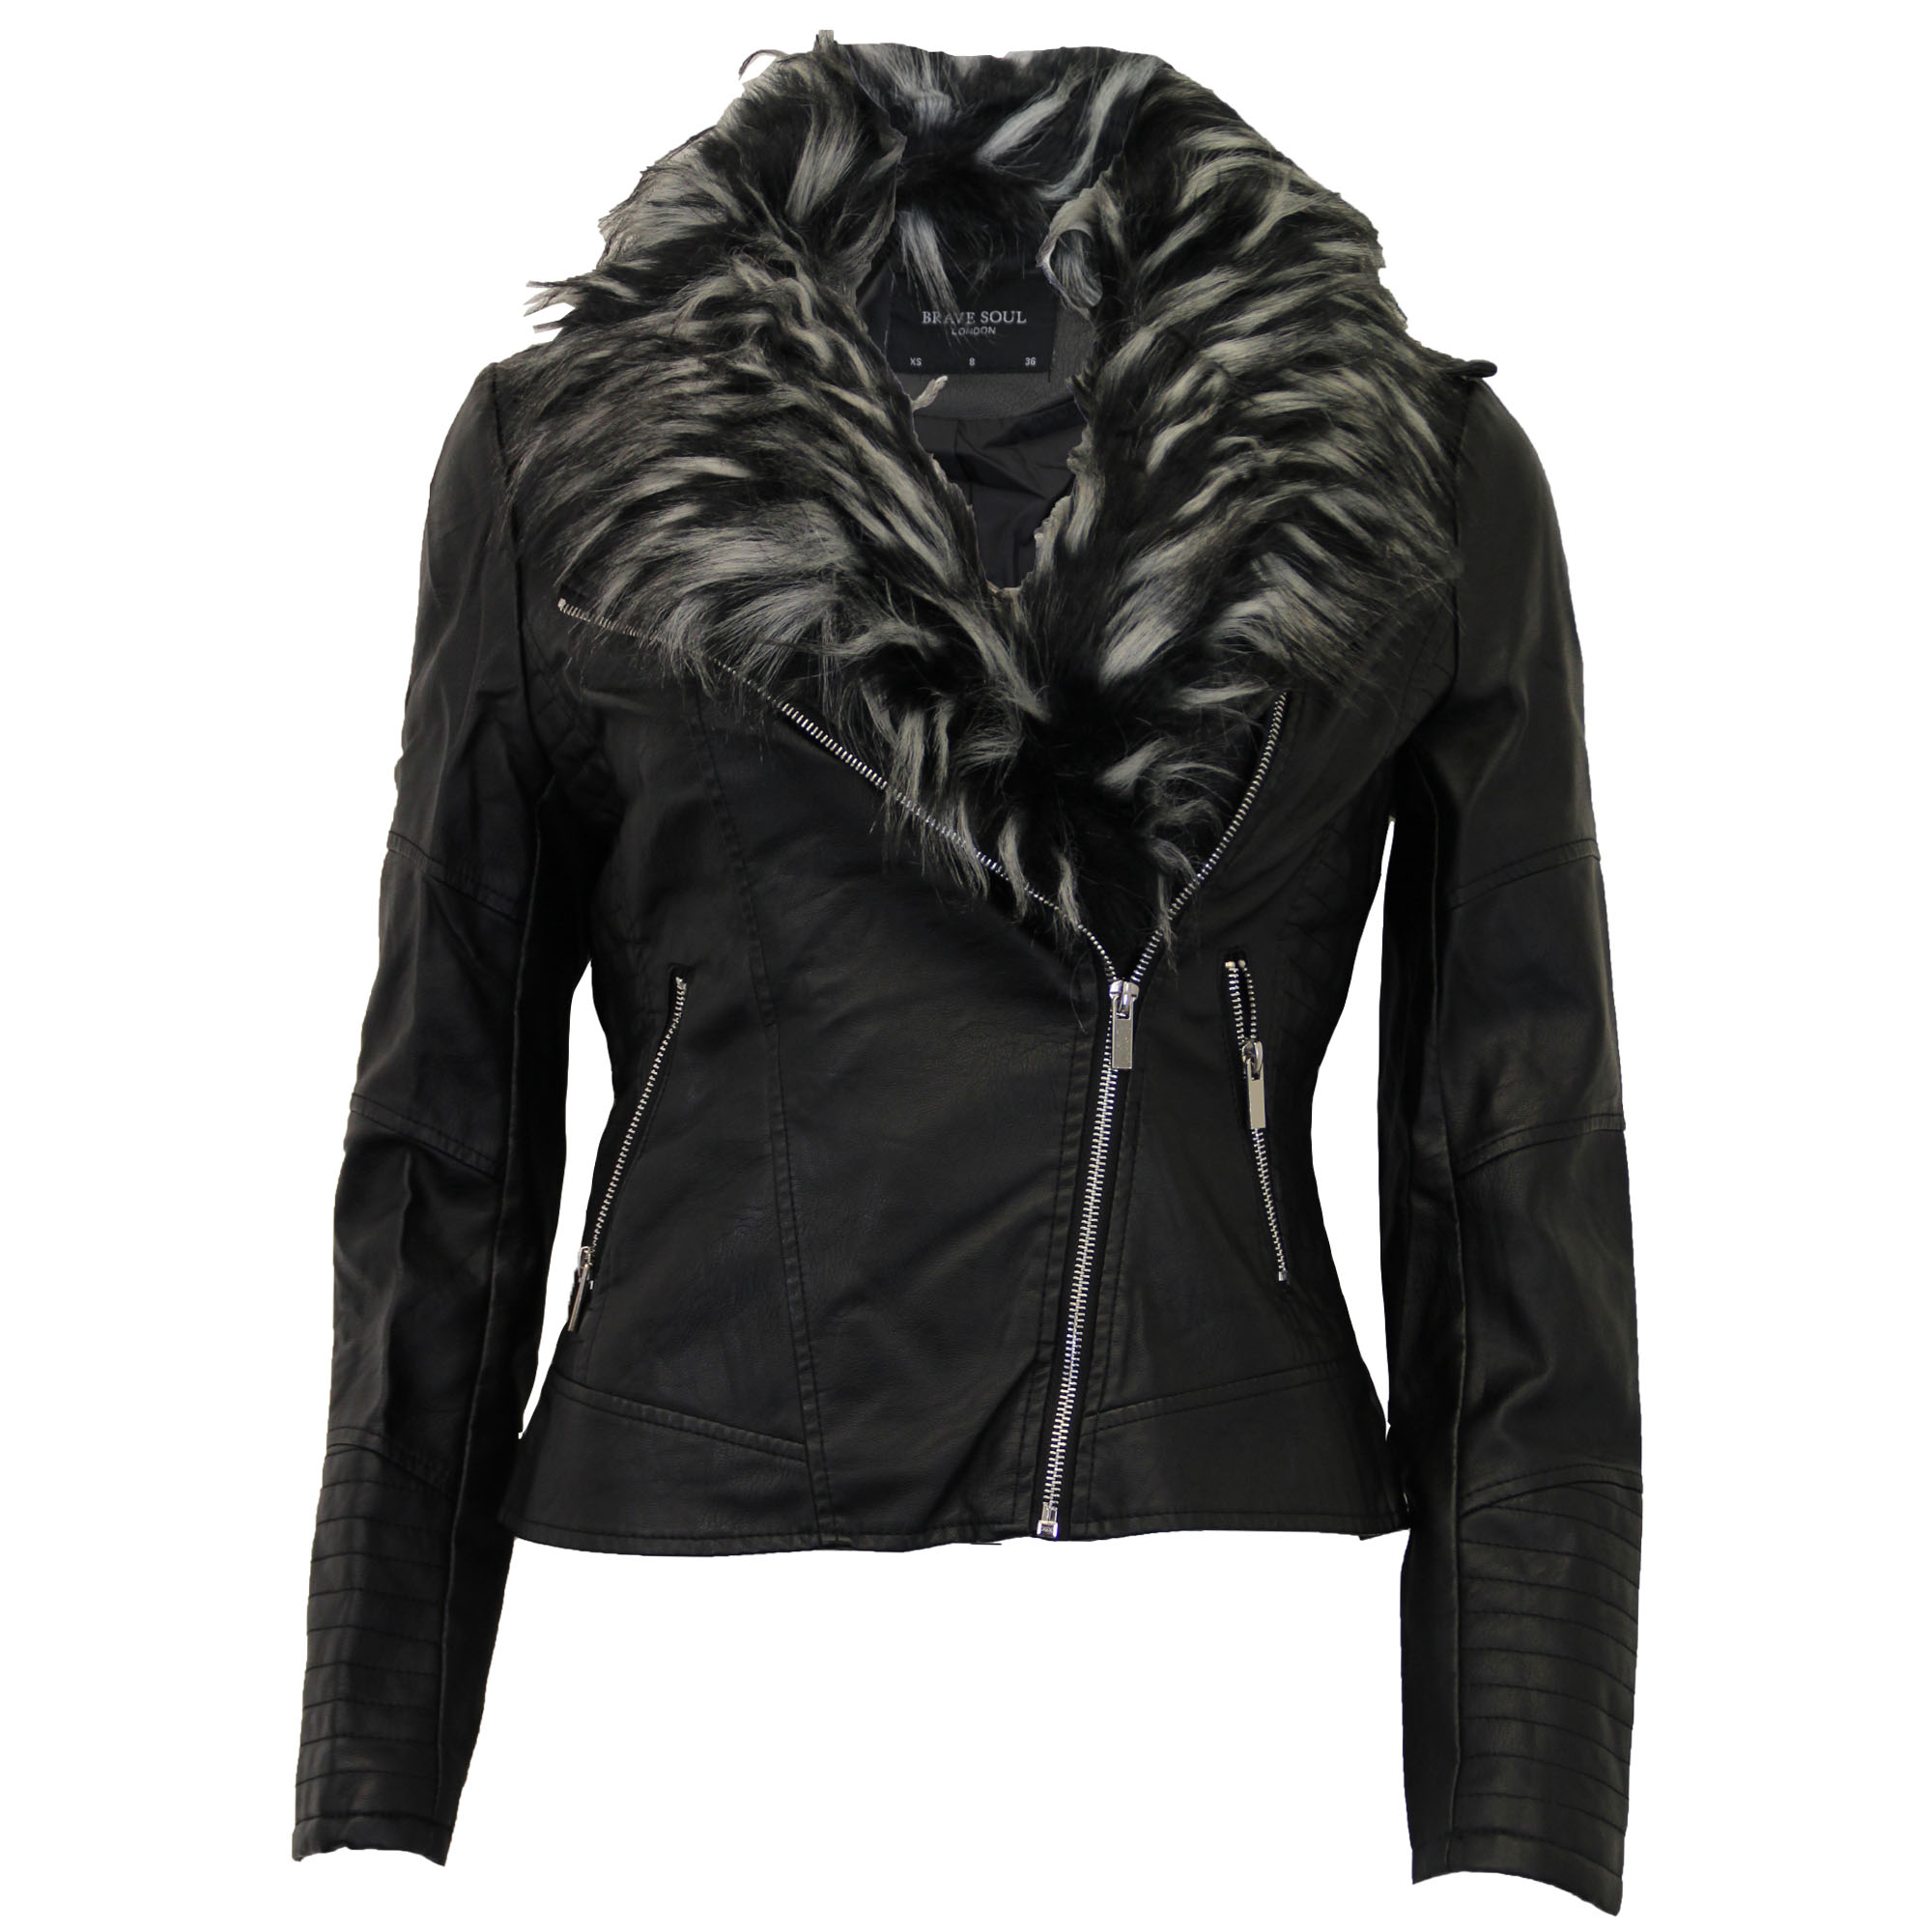 Ladies-Biker-Jacket-Brave-Soul-Womens-Coat-Zip-Fur-Leather-Look-Bomber-Fashion